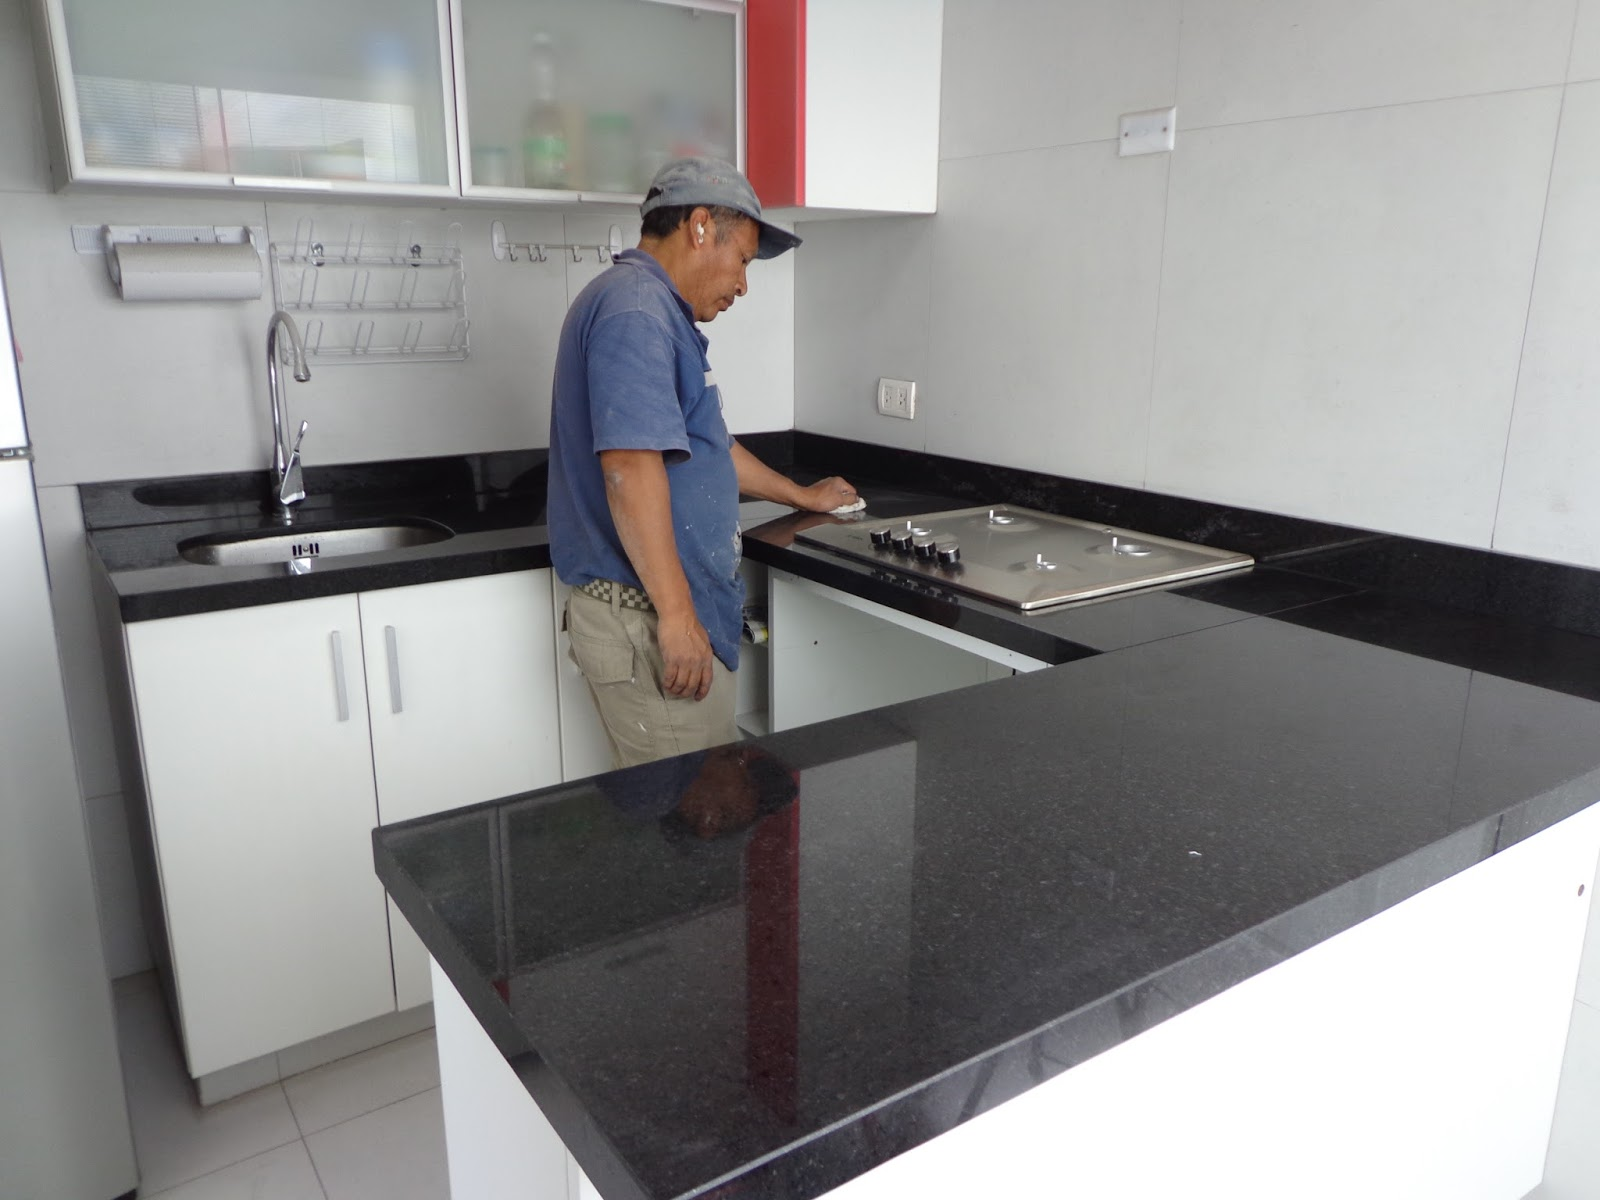 Cocinas vitroceramicas empotradas granito marmol lima for Barras de granito para cocina